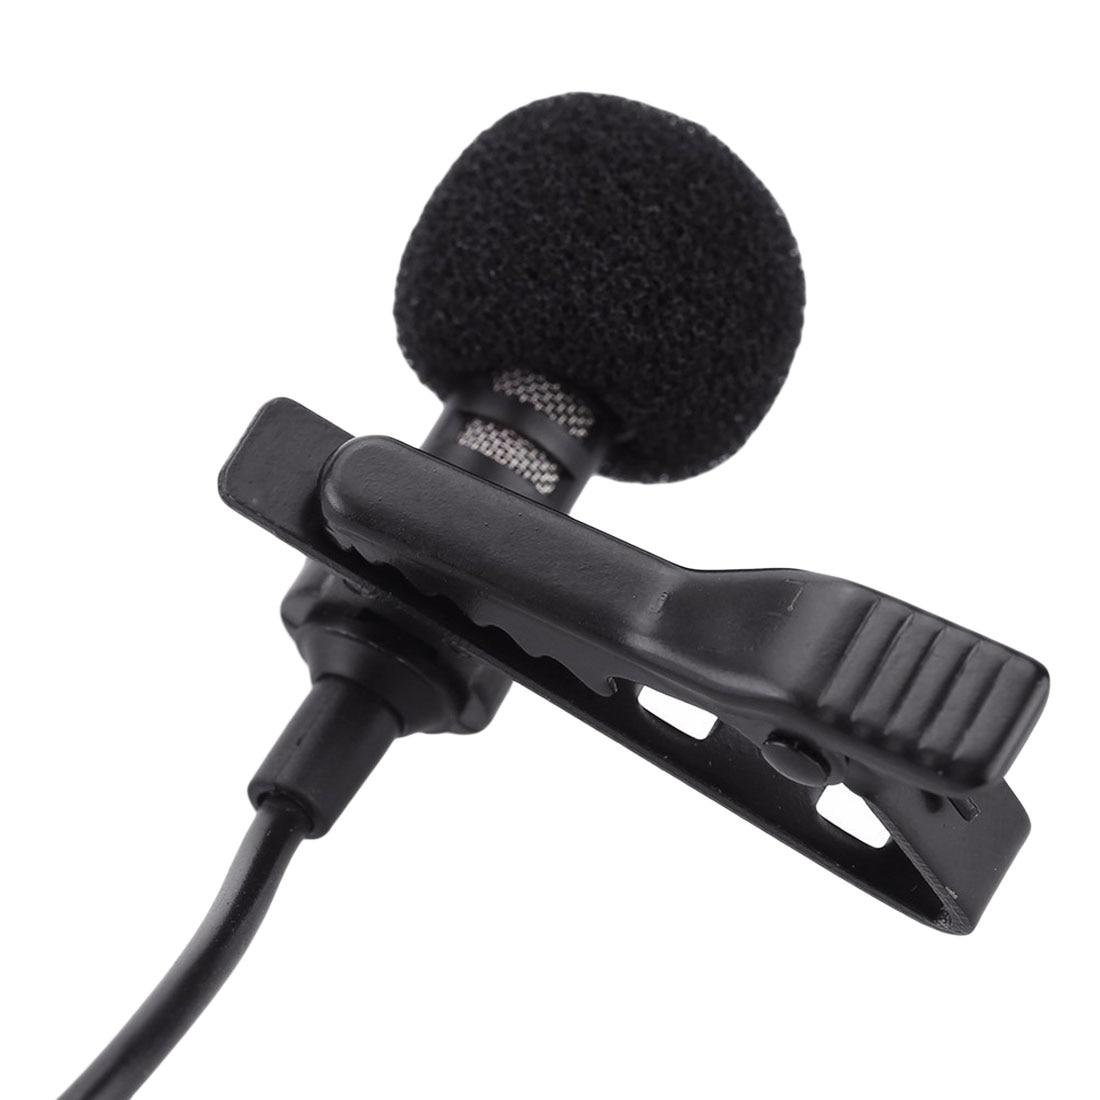 Marsnaska 3.5Mm Mini Microphone Recording K Song Phone Small Microphone Phone K Song Lapel Microphone